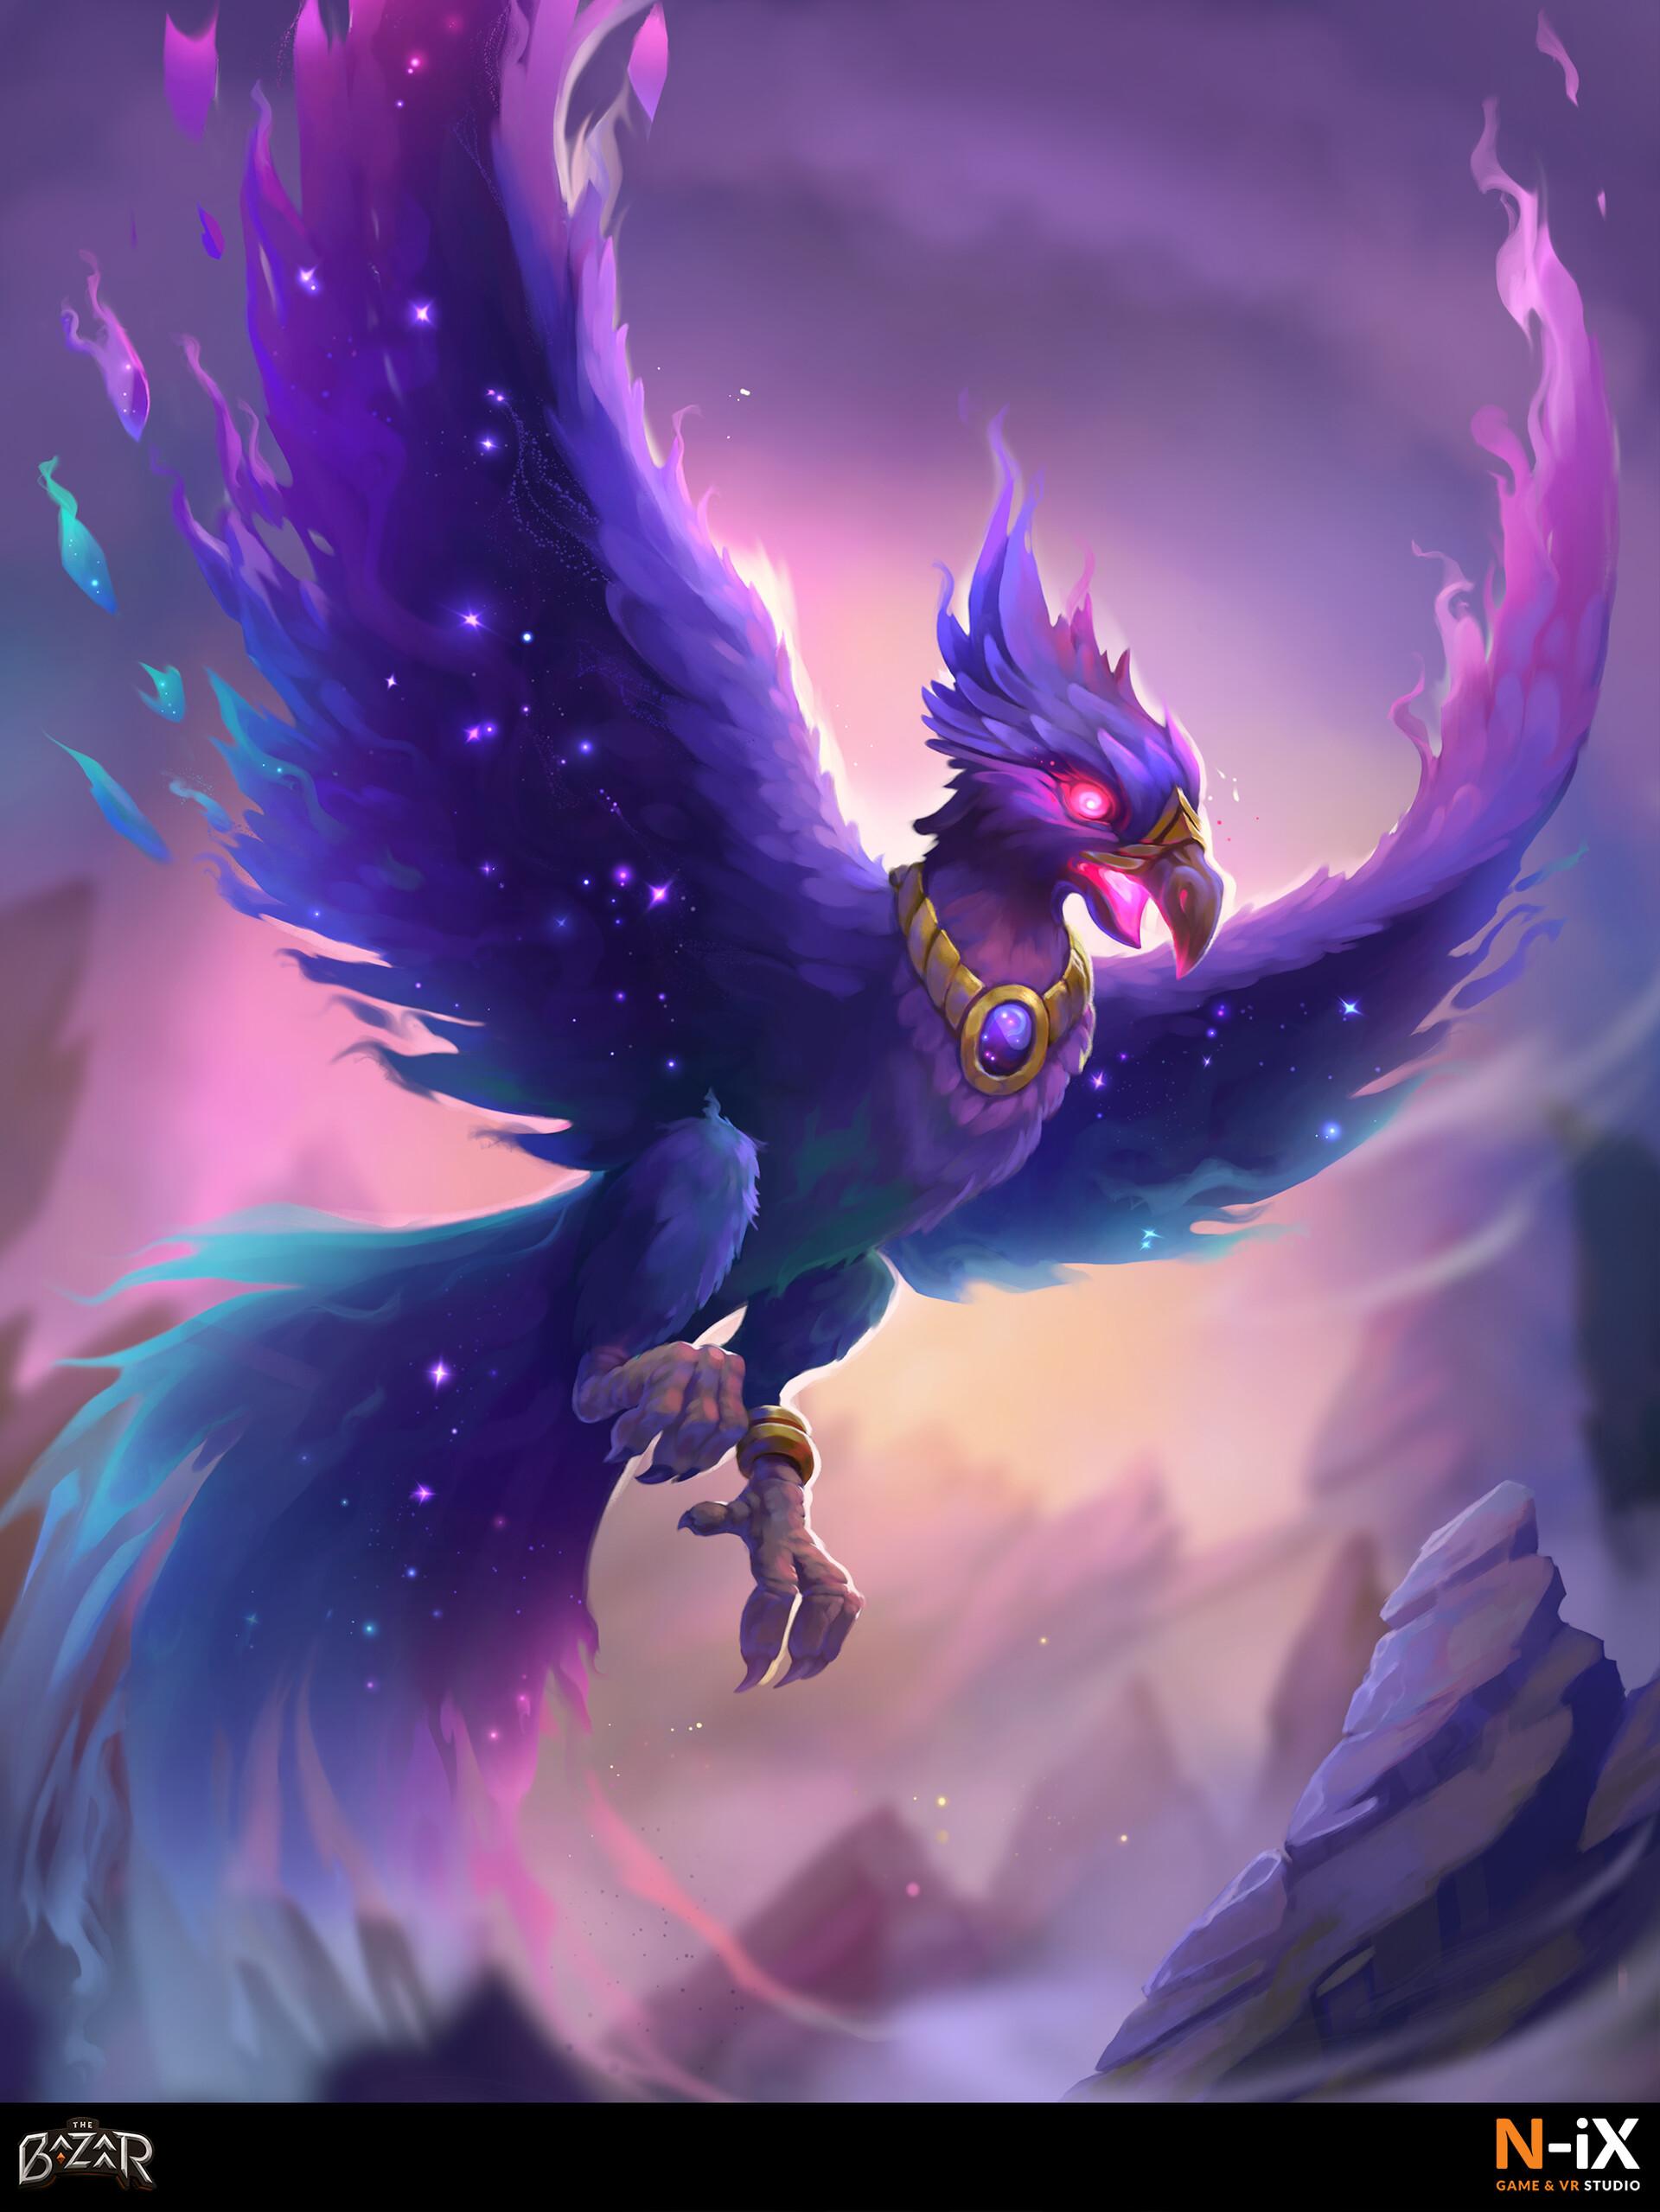 The Bazaar Guardian bird card artwork based on backers description